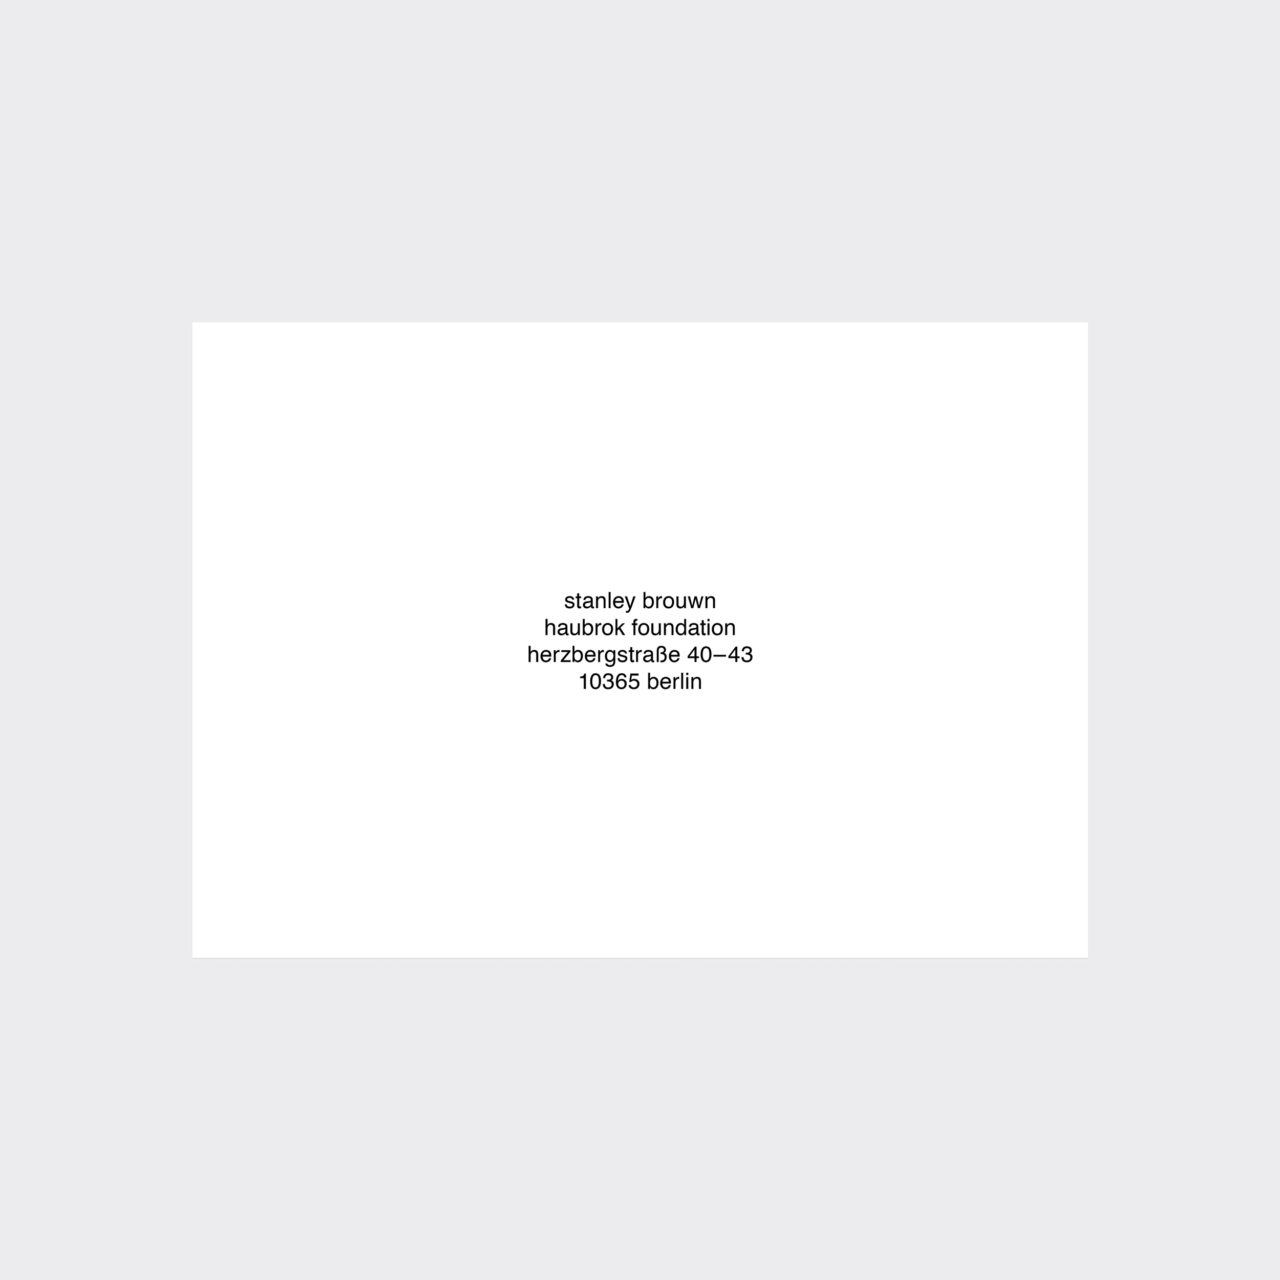 Stanley Brouwn, Stanley Brouwn (announcement card) (2018)